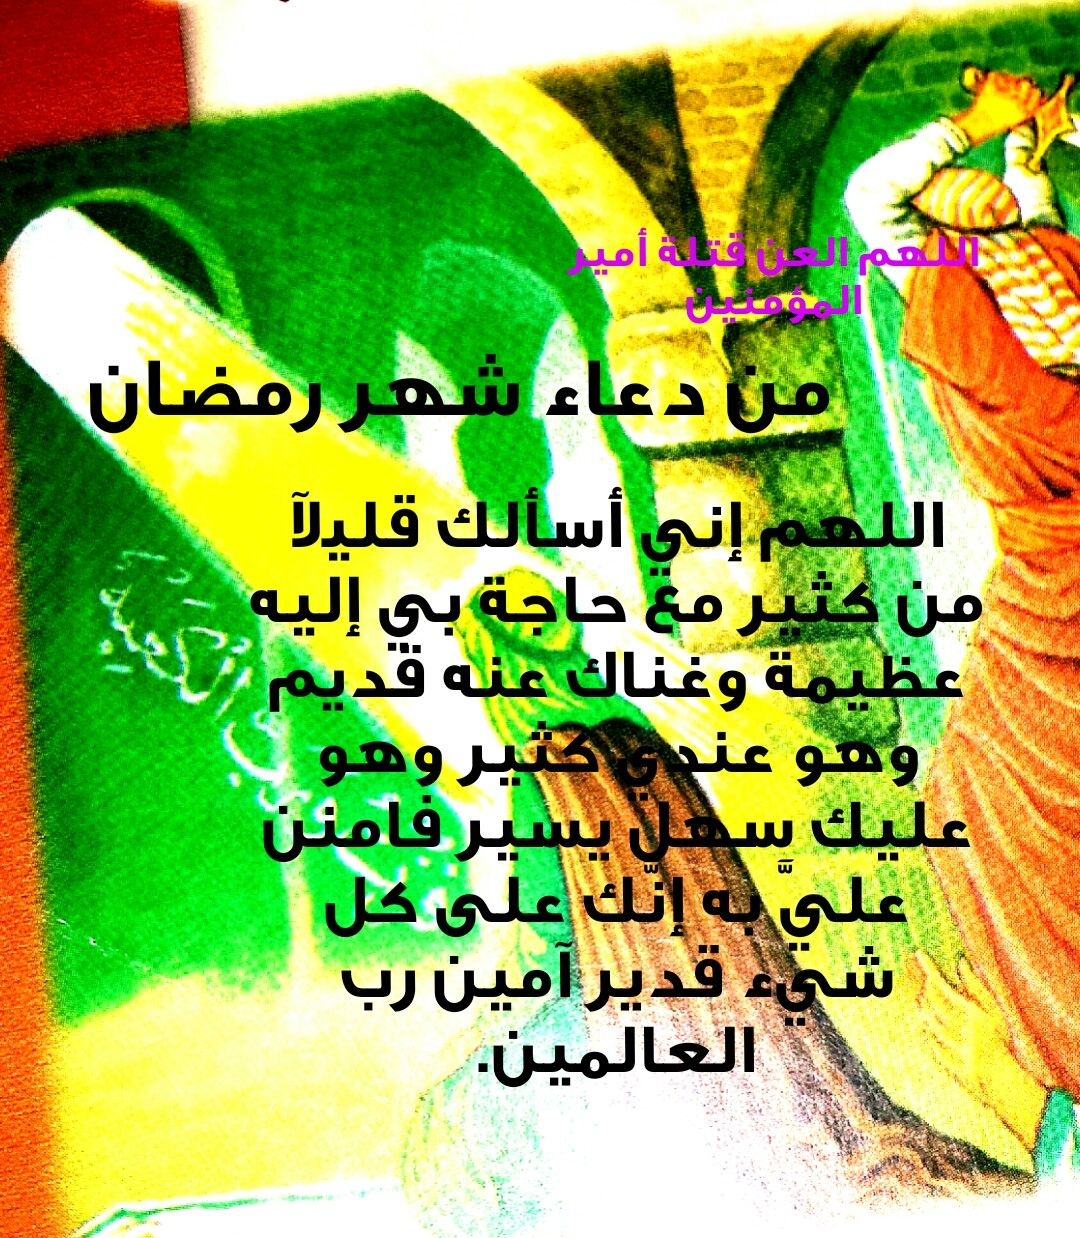 Pin By Latifa Elkheshen On شهر رمضان شهر الرحمة والغفران Sal